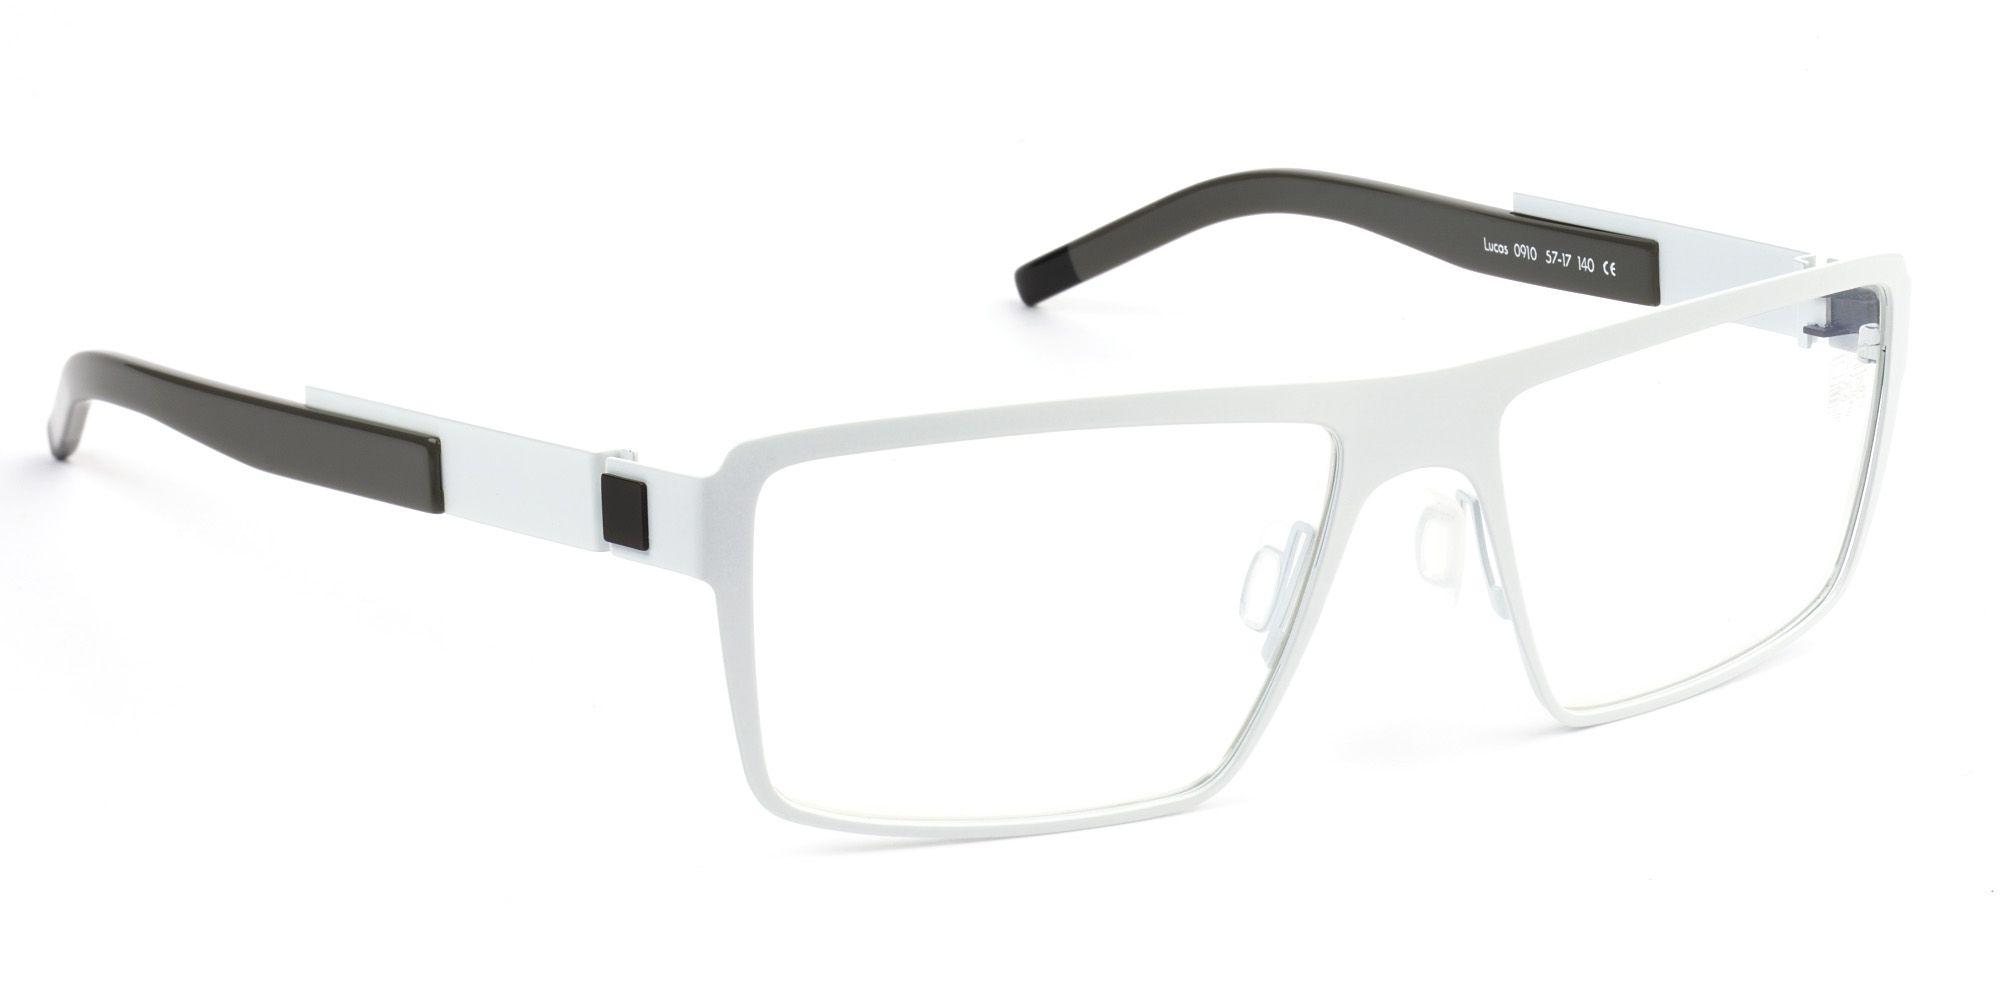 155a973bc497 De Stijl Holland 1924 eyewear  men eyeglasses frame LUCAS in matte white  metal 0910   discontinued color as of Nov 2013